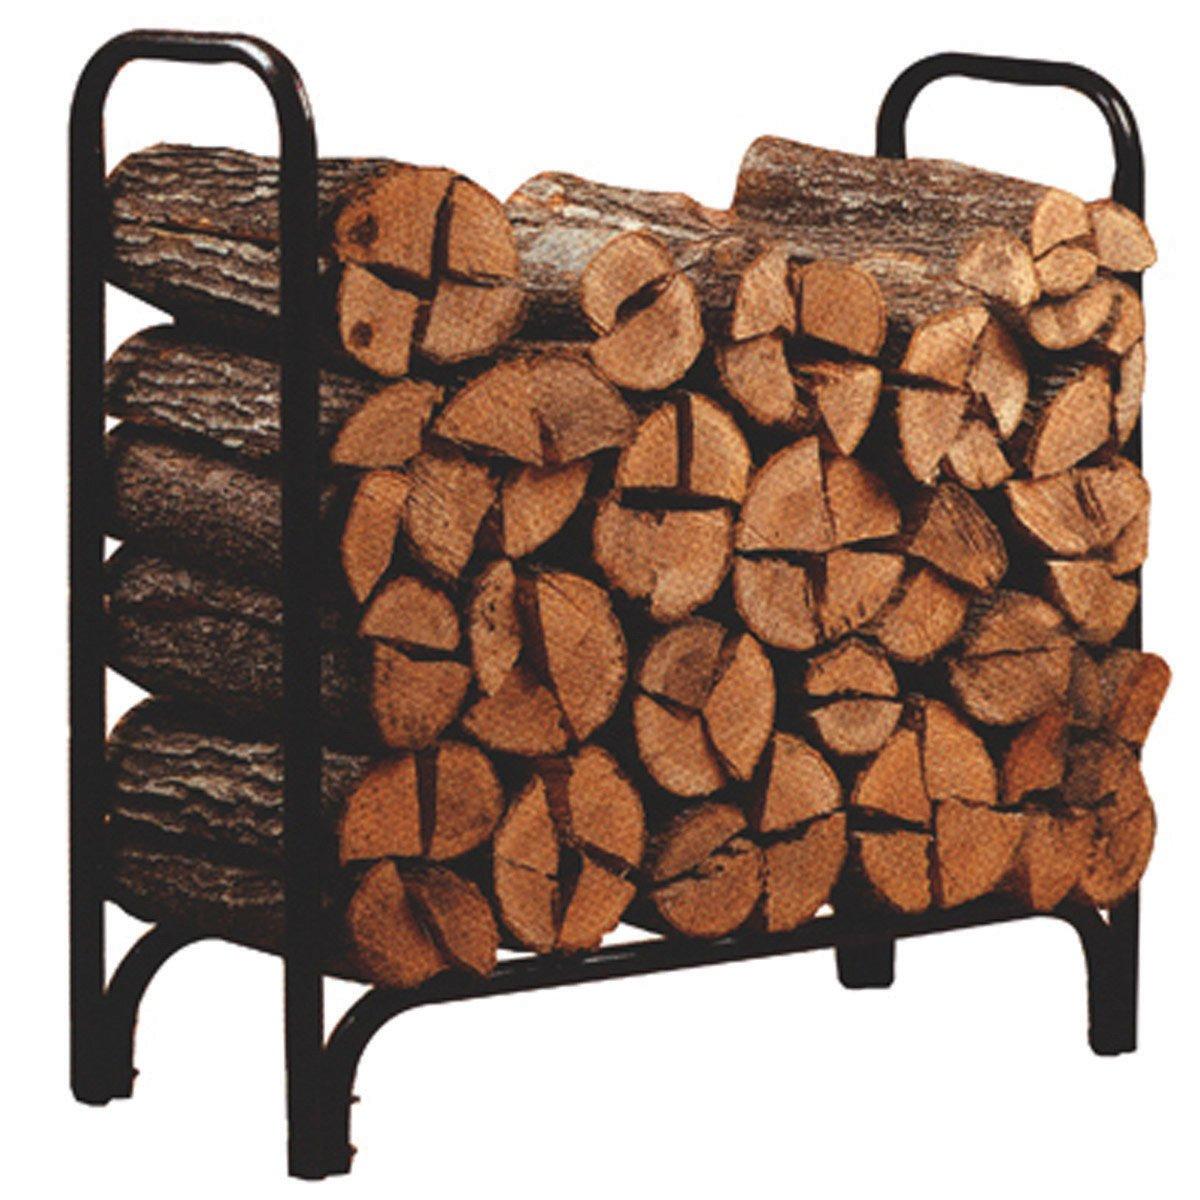 4 Foot Fireplace Outdoor Log Bin Wood Storage Rack